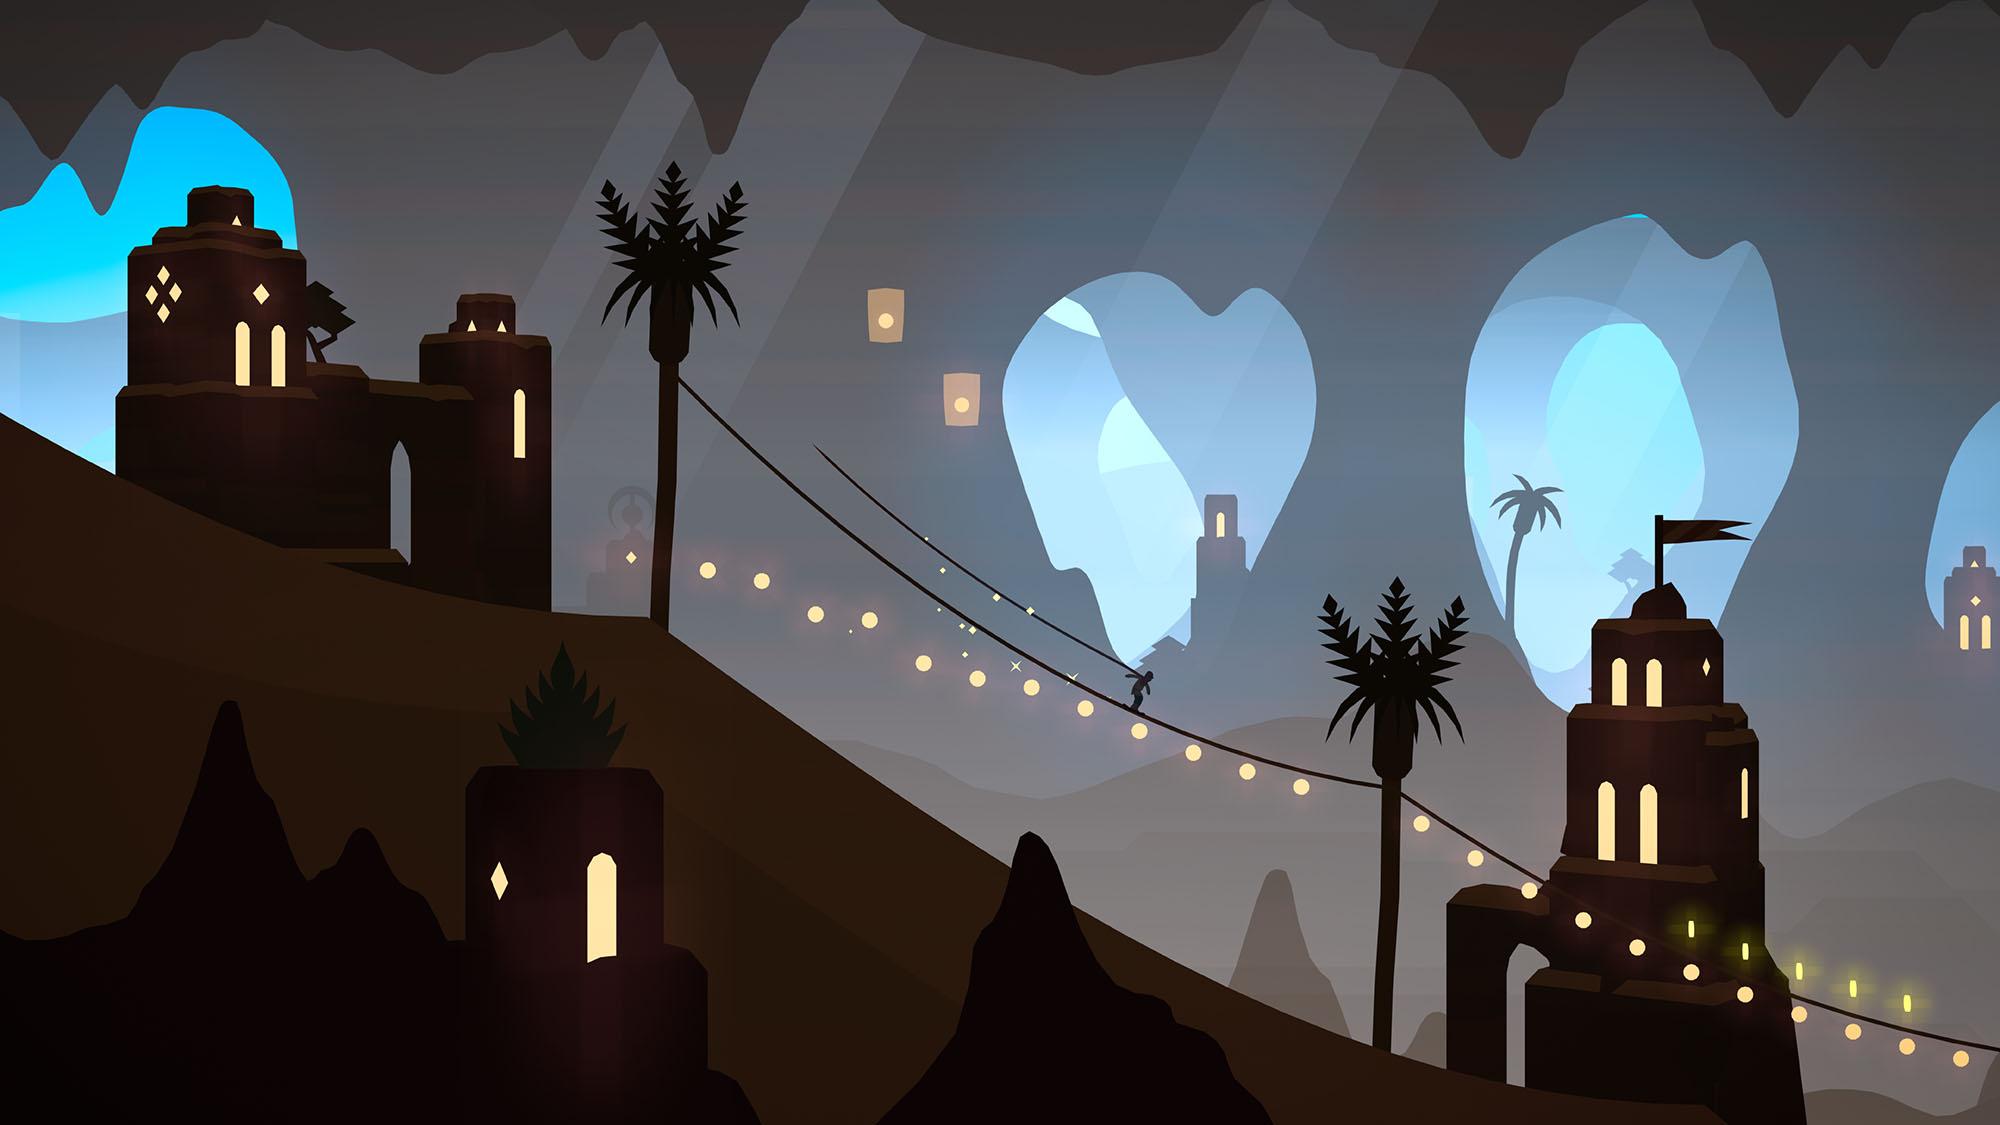 Alto's Odyssey The Lost City Screenshot